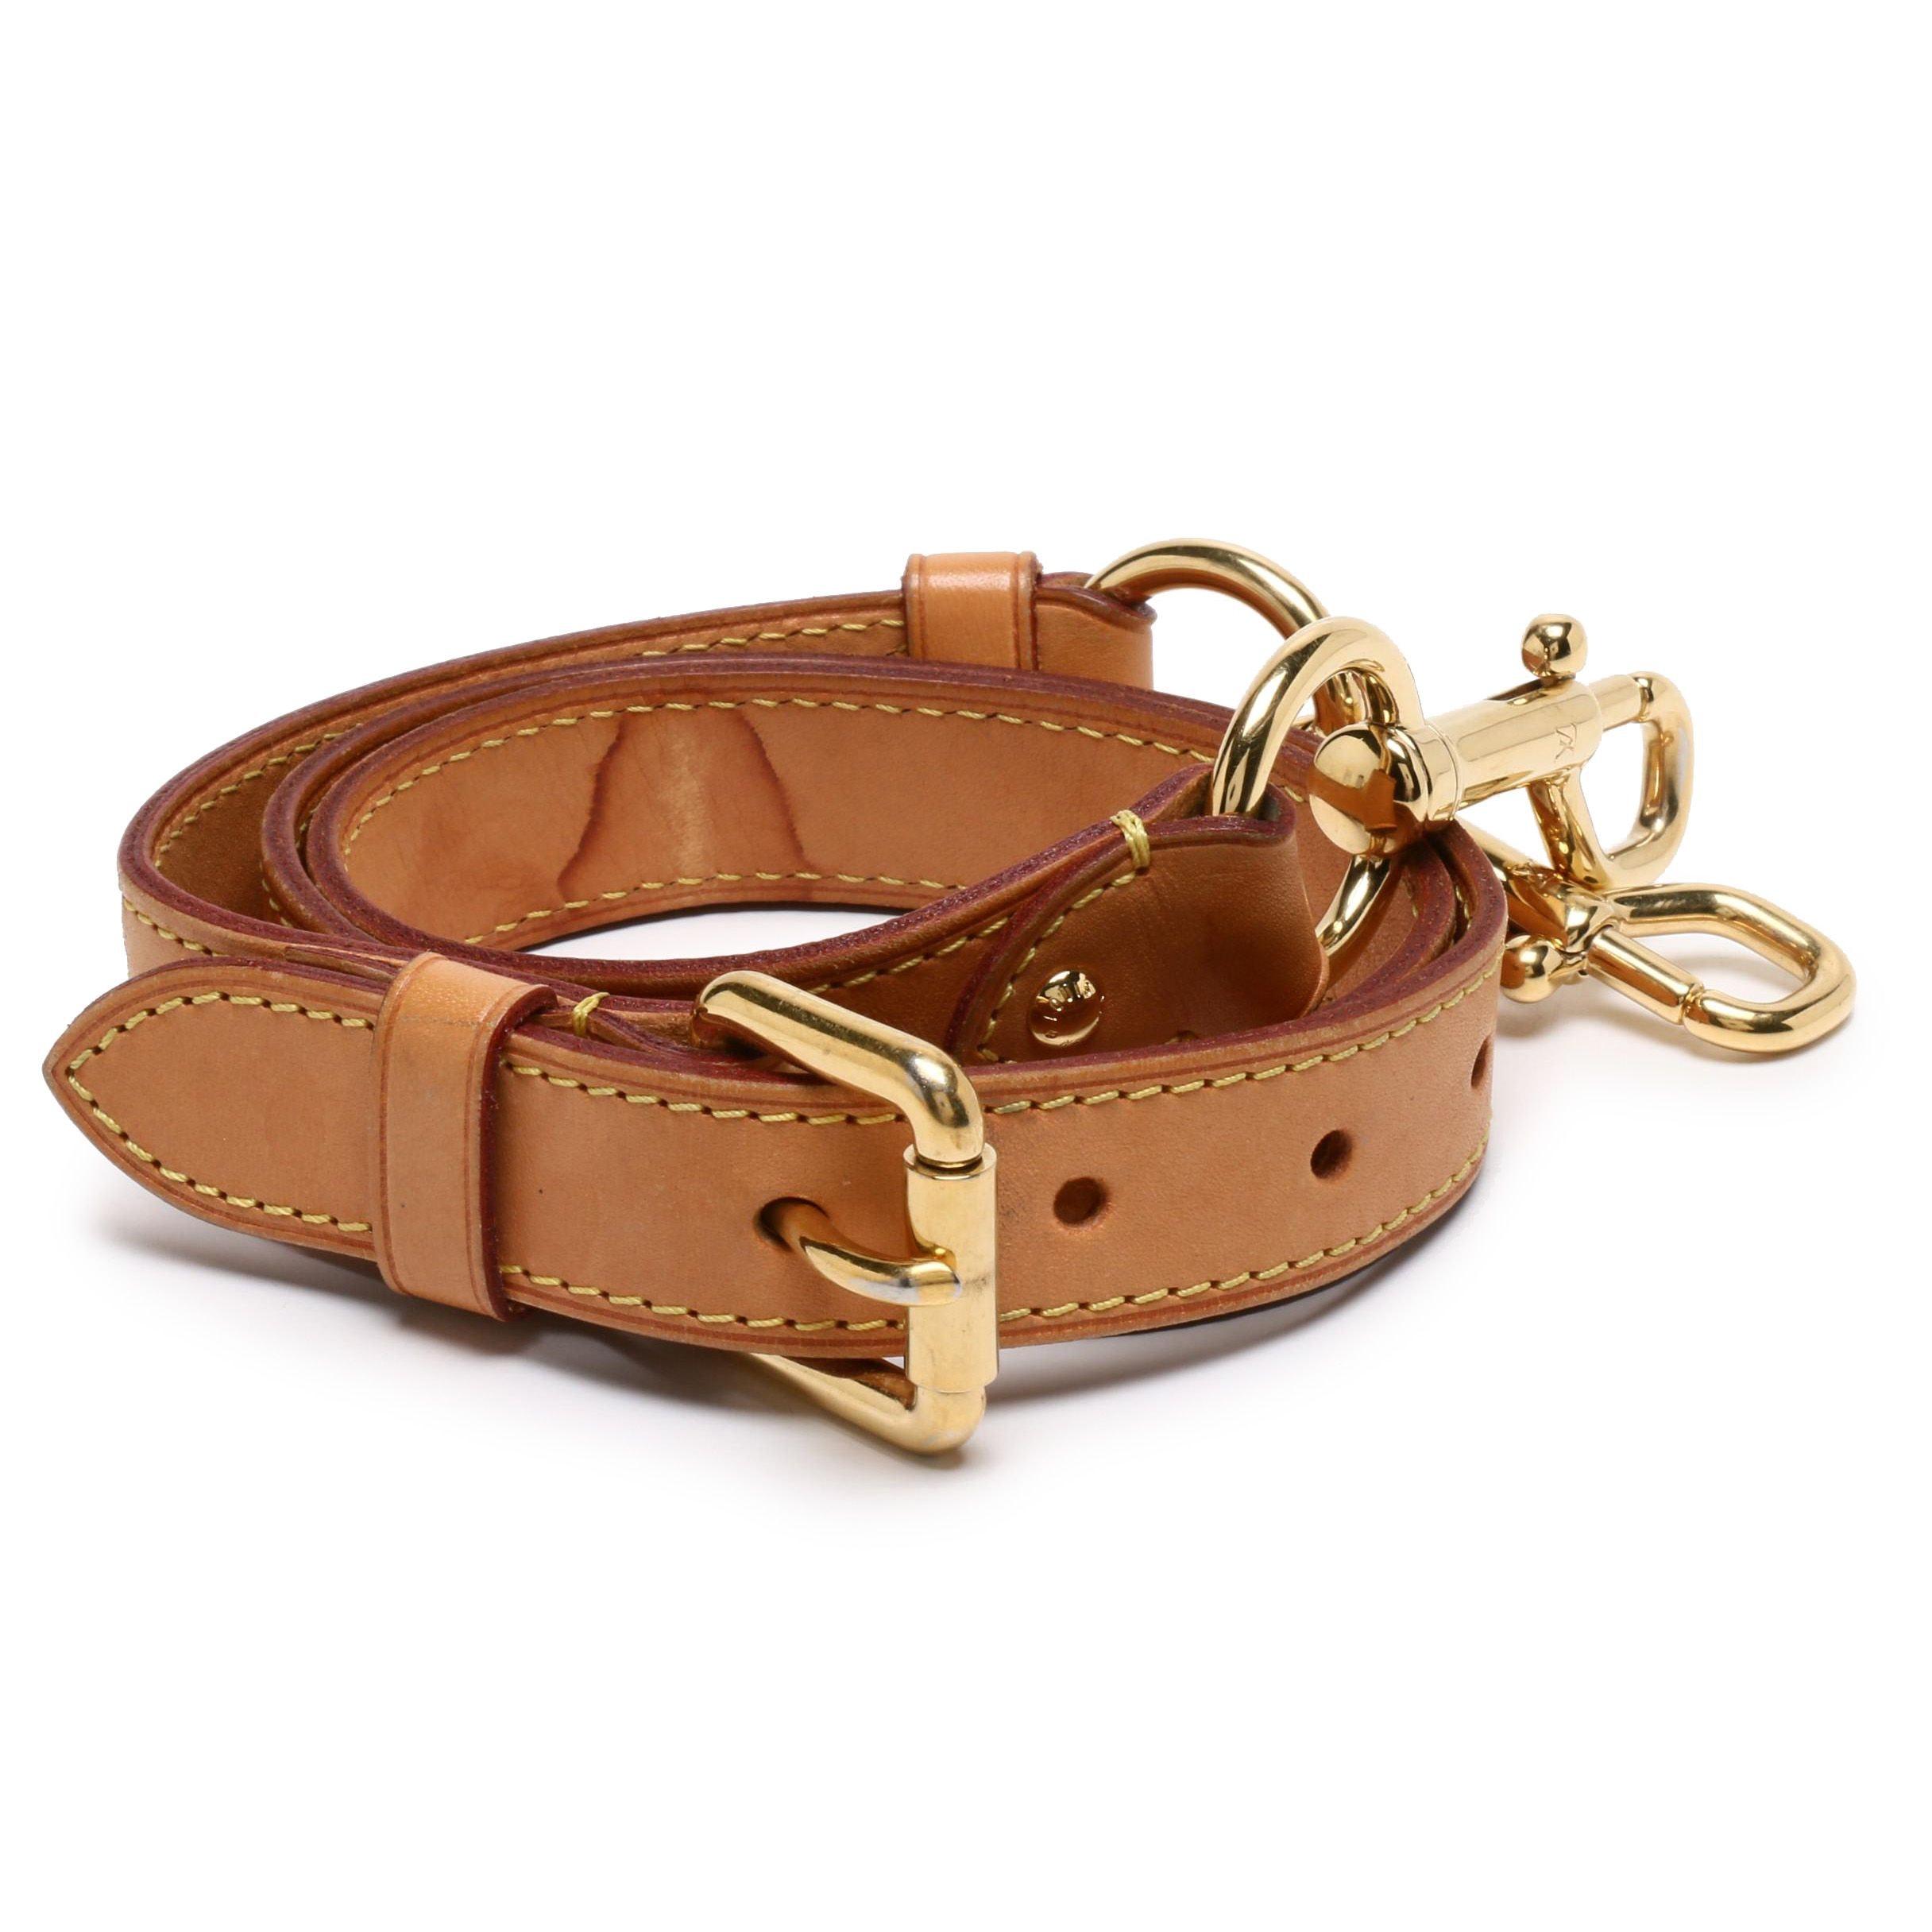 Louis Vuitton Vachetta Leather Adjustable Shoulder Strap